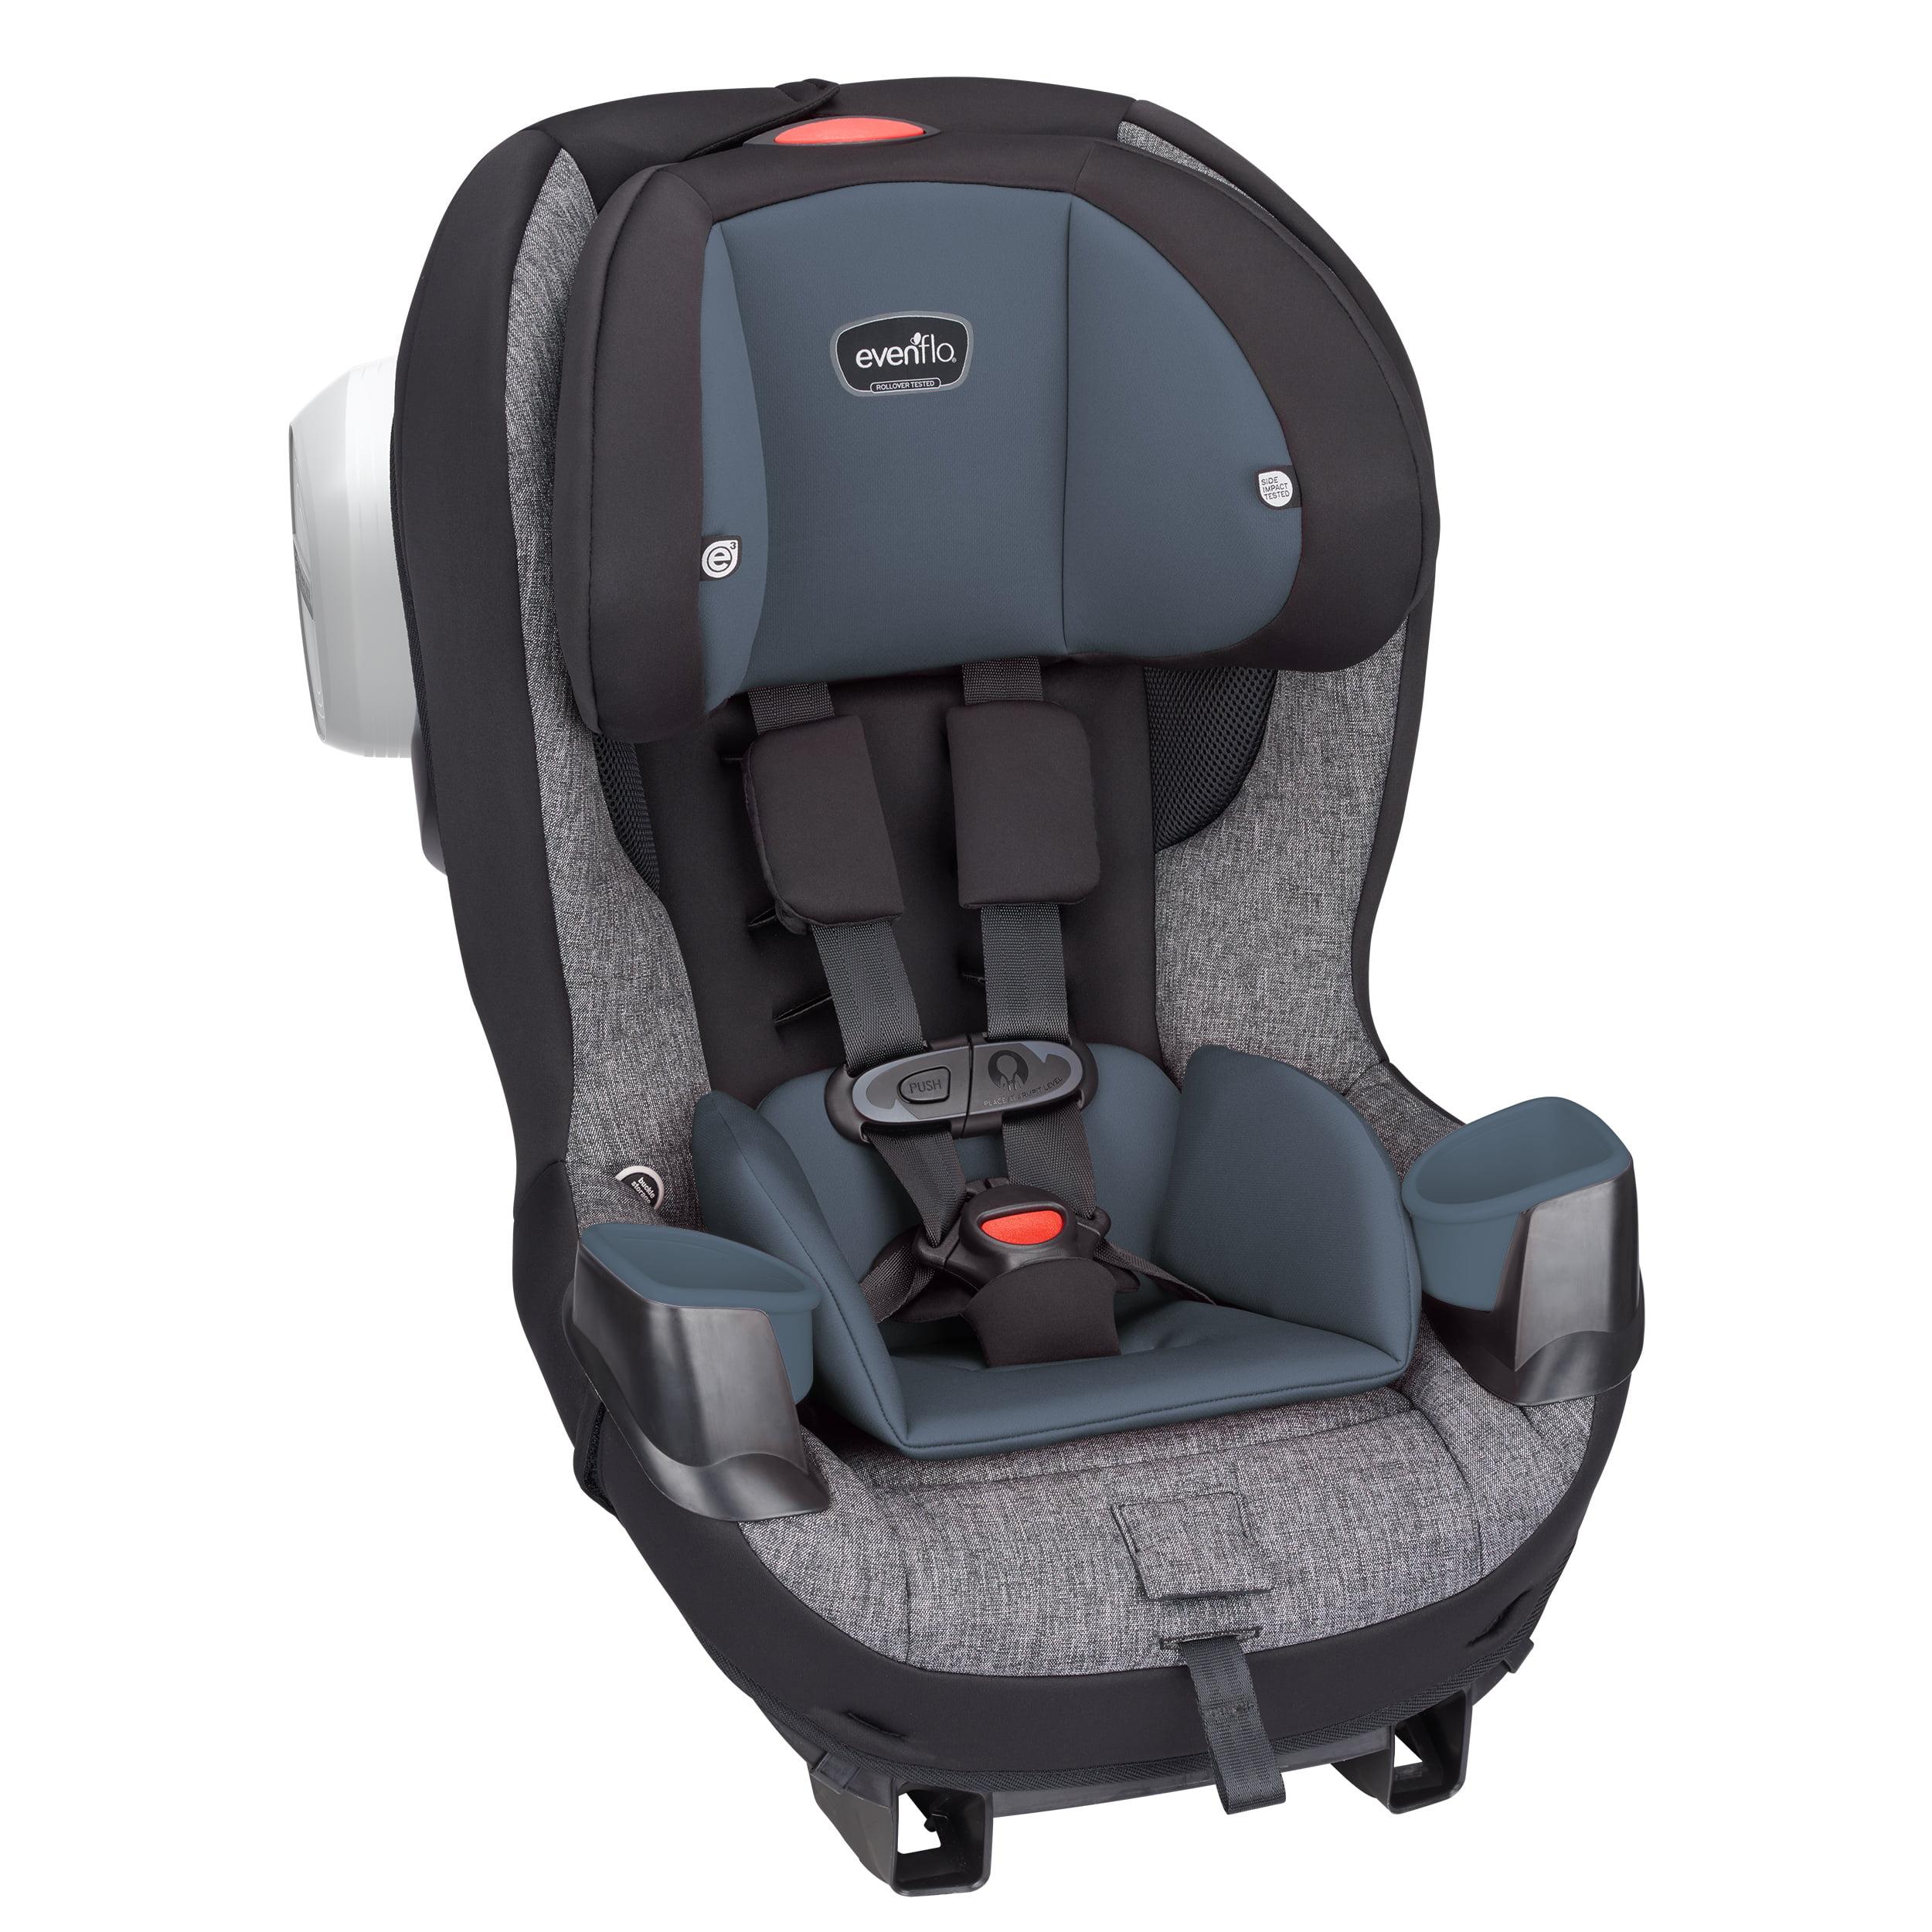 Evenflo ProSeries Stratos Convertible Car Seat, Augustus Tweed